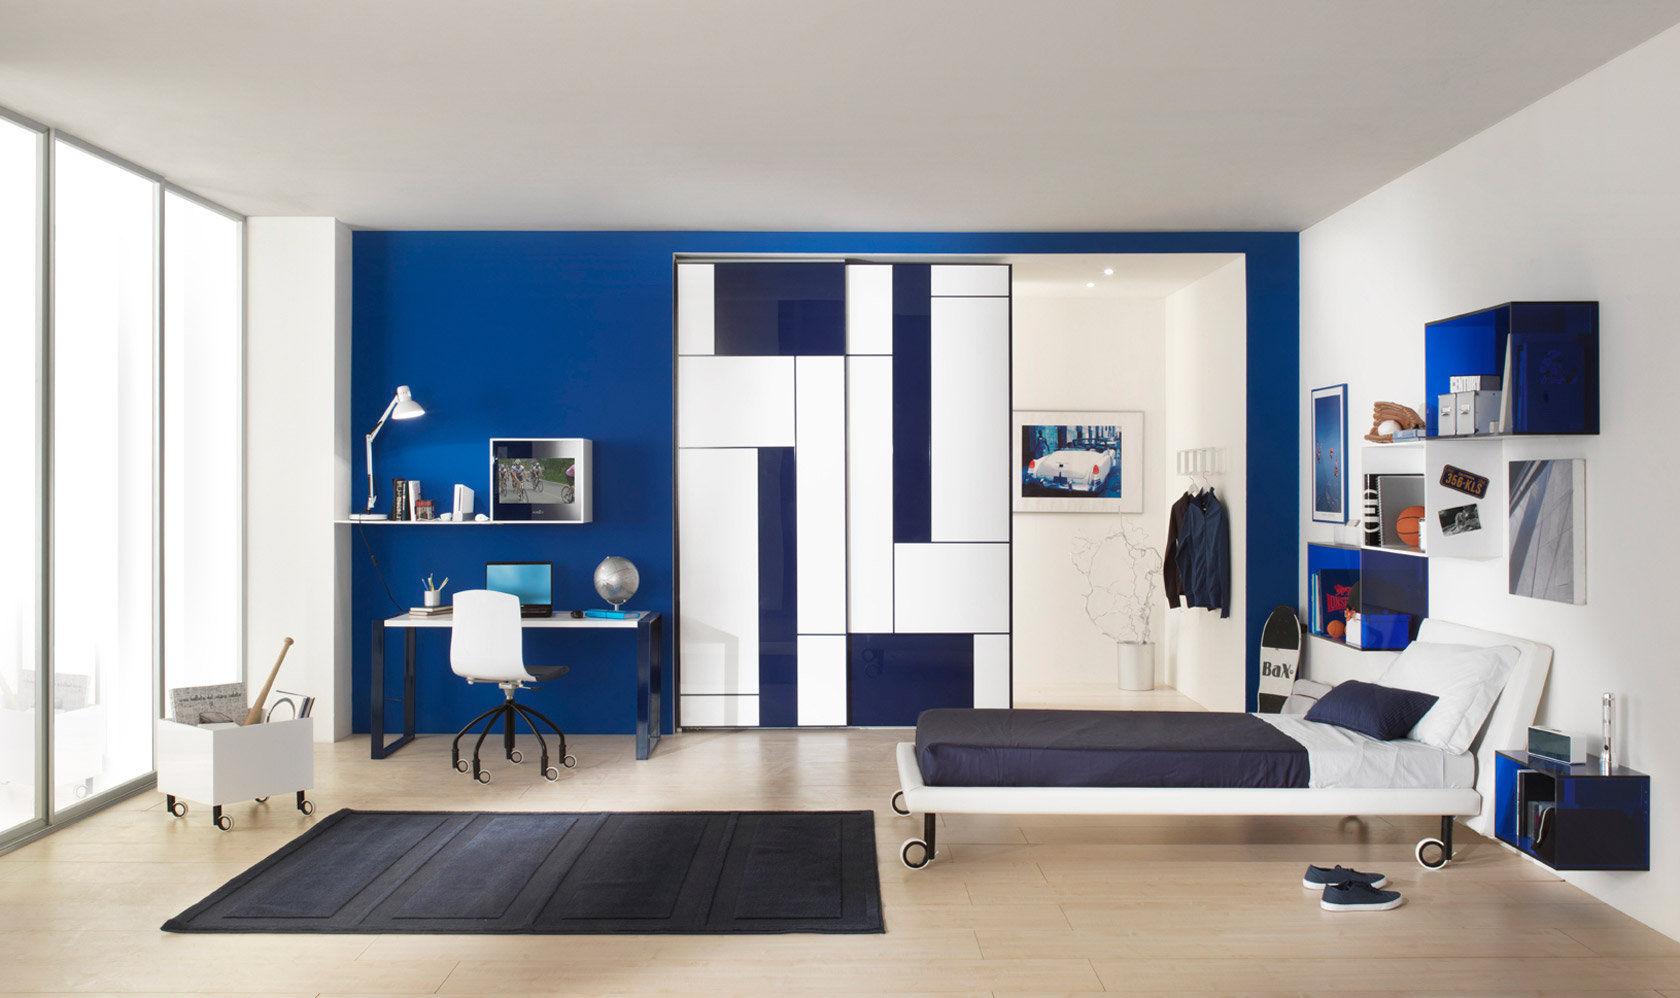 Boys bedroom furniture set white KUBIKA COMPOZIONE 3